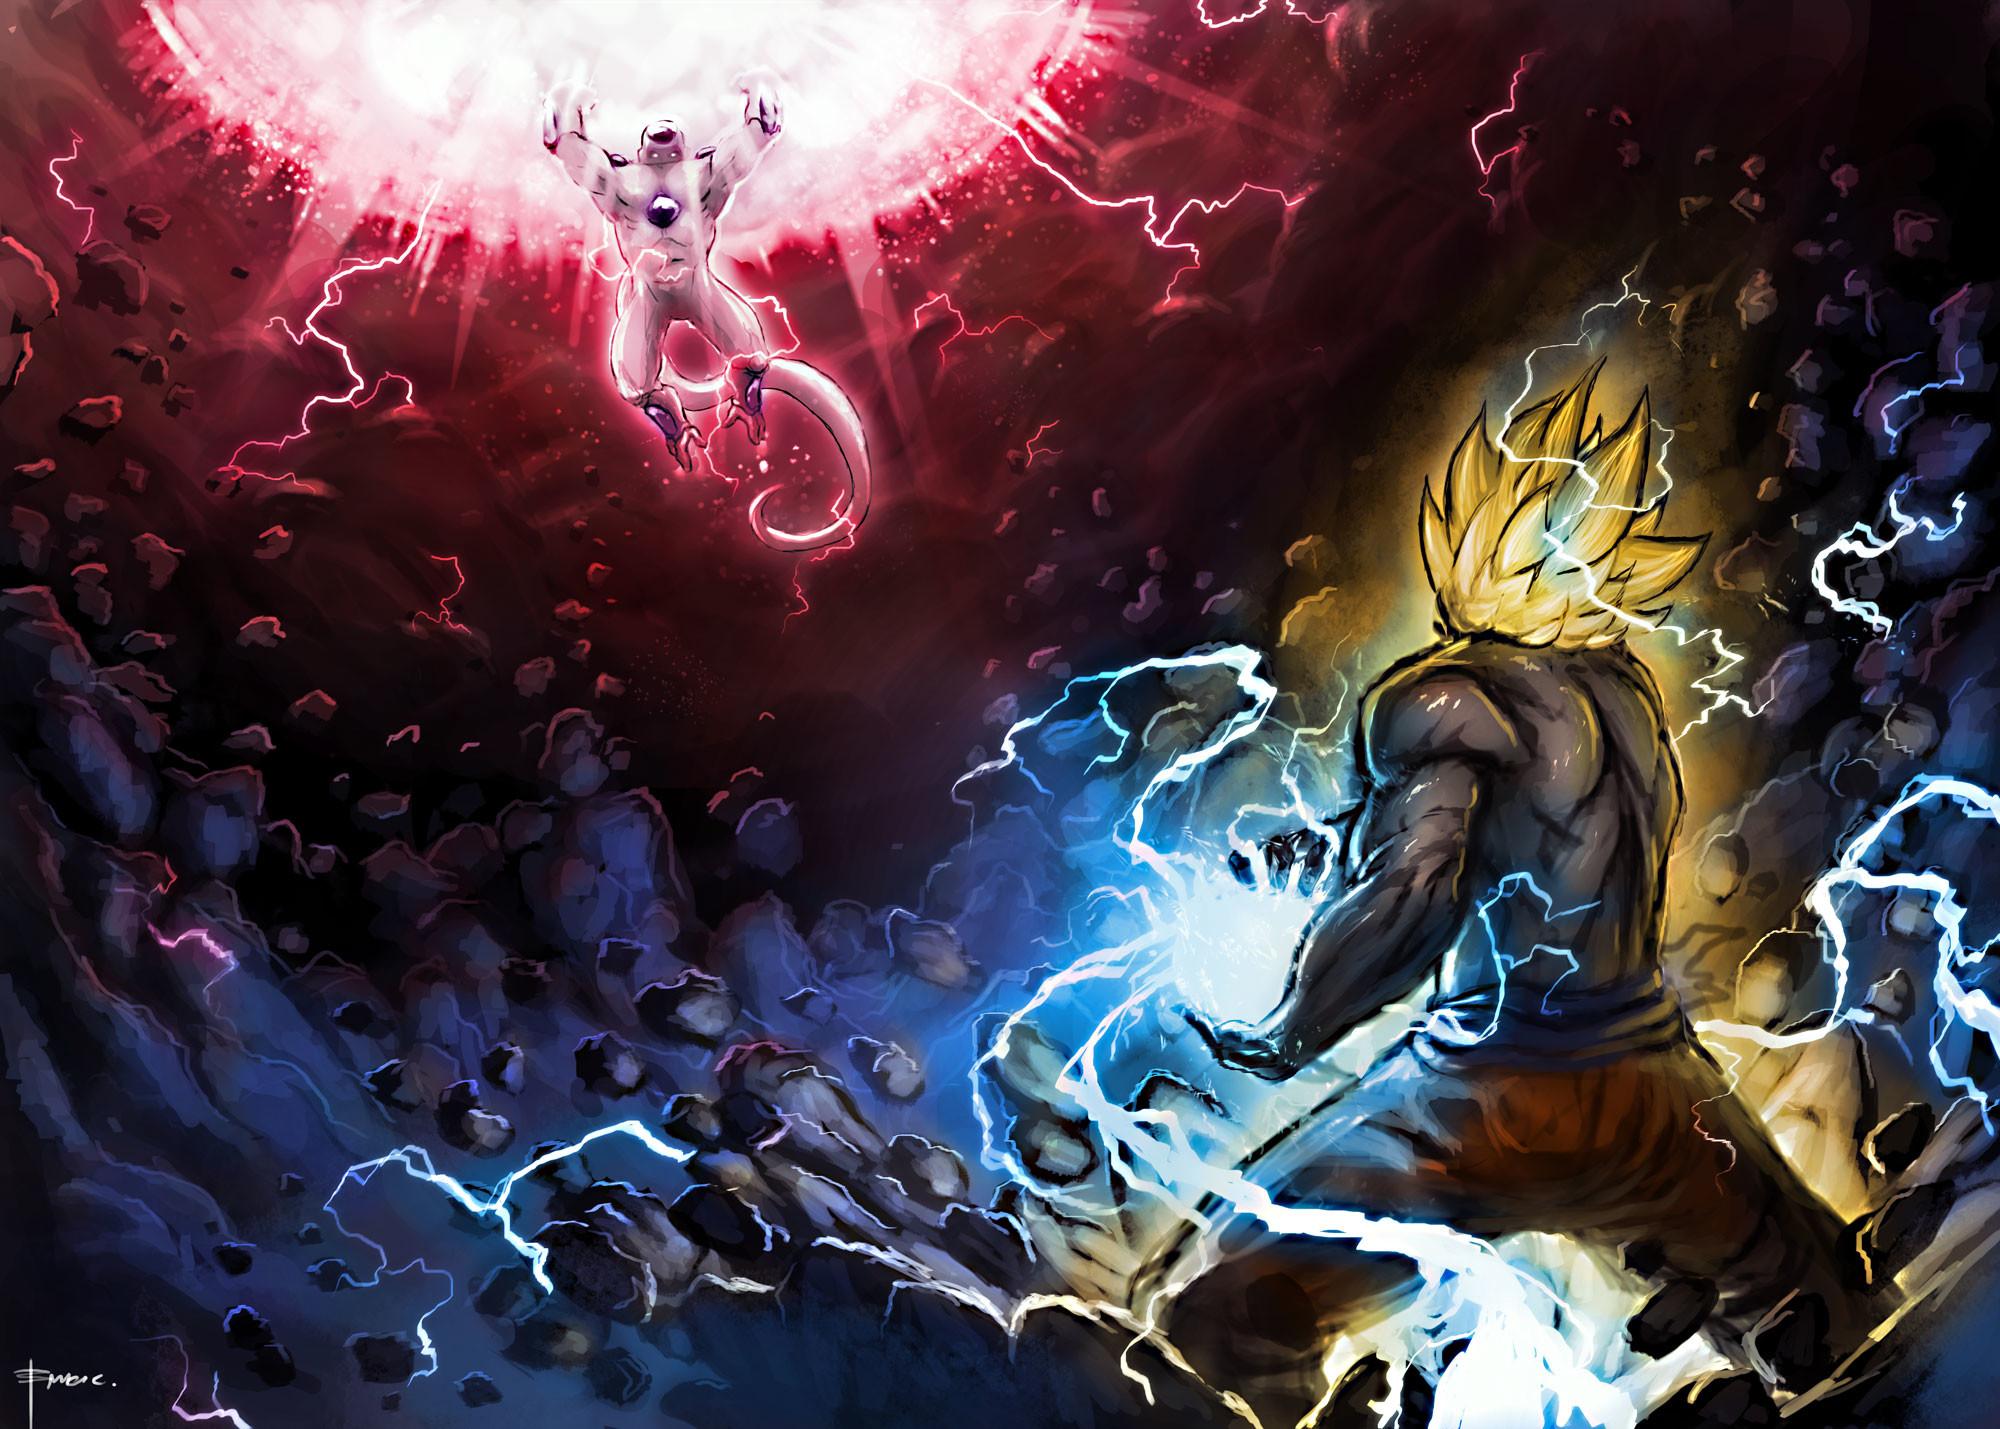 Wallpaper Dragon Ball Z Goku 73 Images